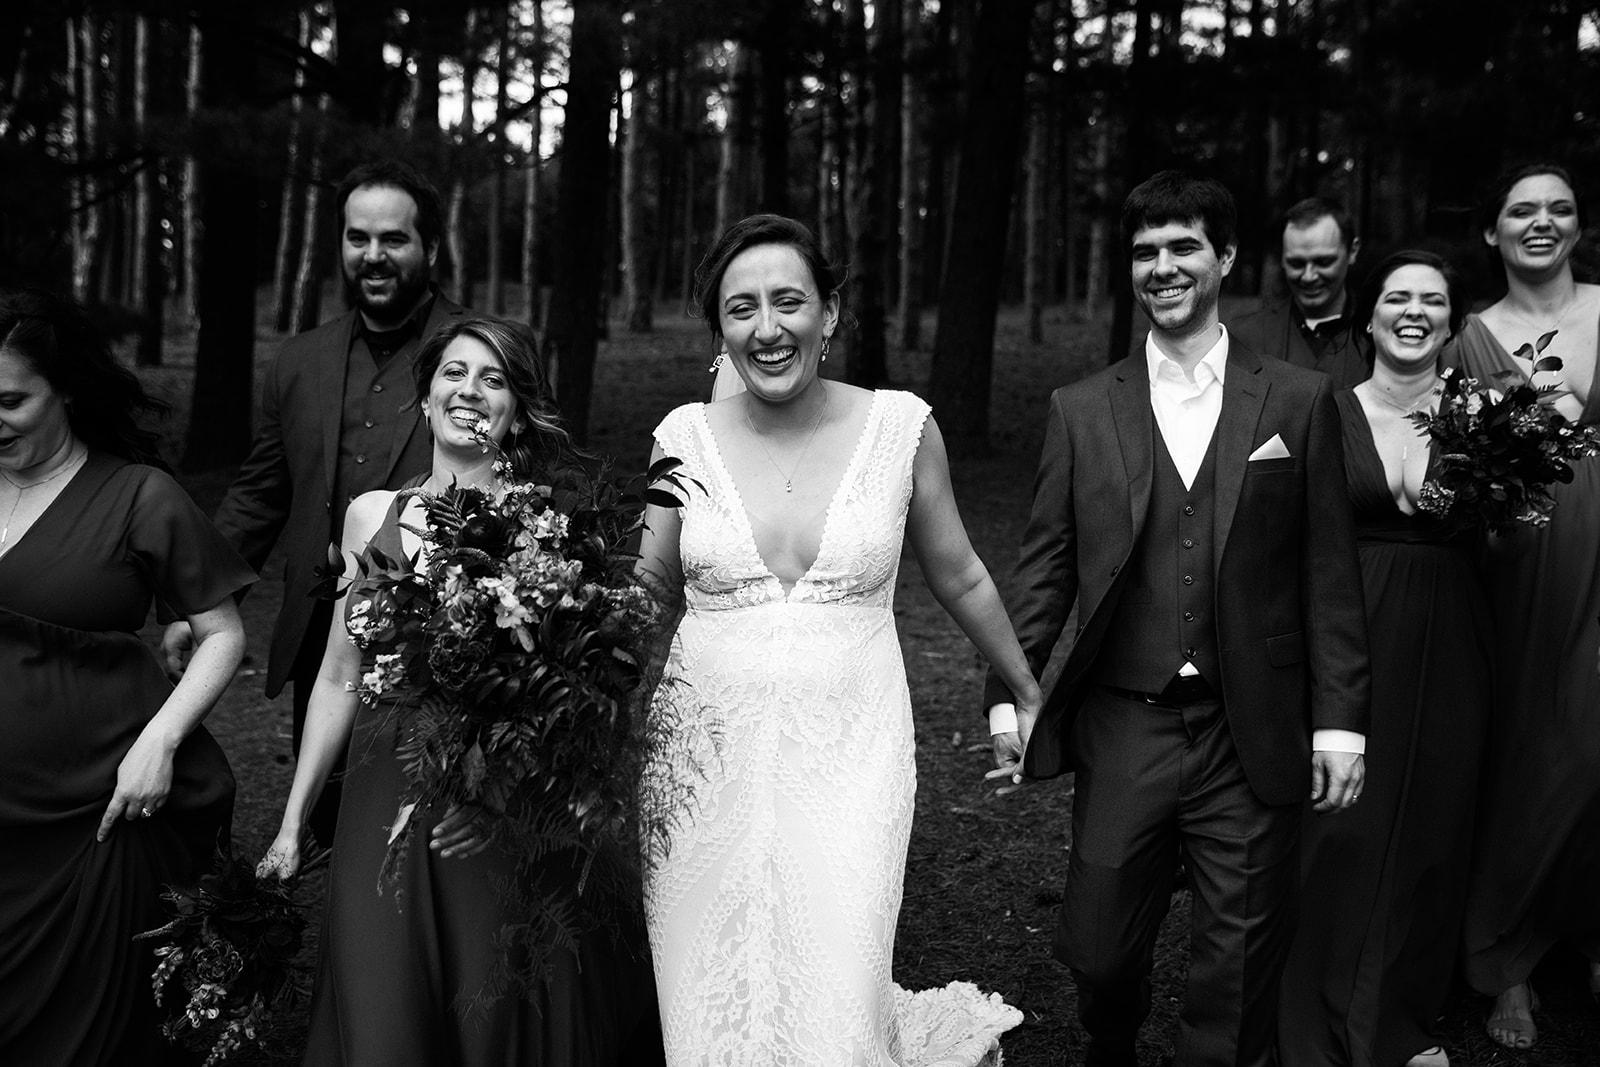 2019-06-01-00-Lindsey+Mat-05_Wedding_Party-meandhimphoto-0086-T5D18719.jpg